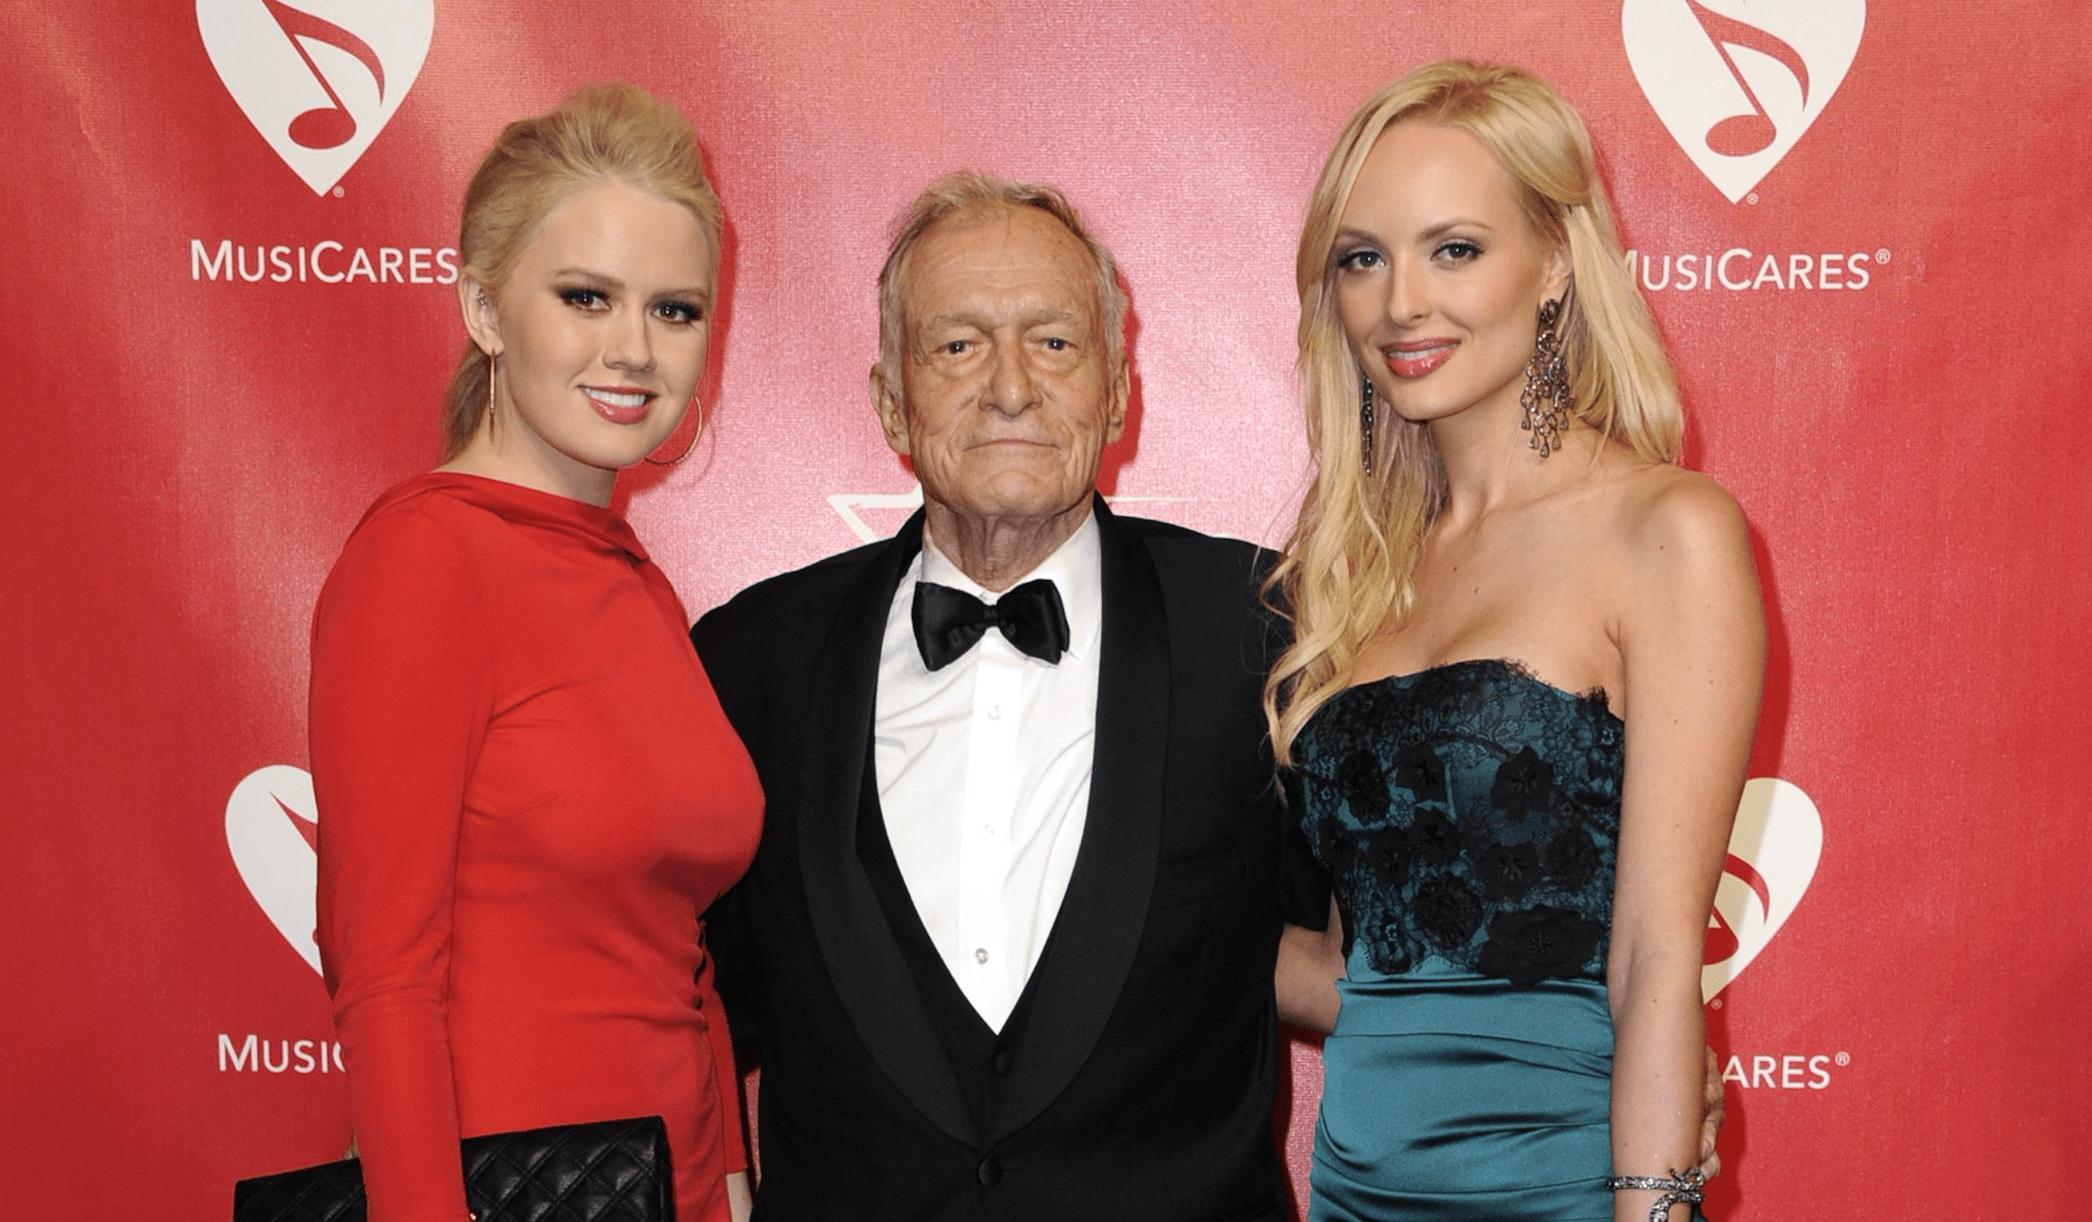 Morto Hugh Hefner, addio al fondatore di Playboy